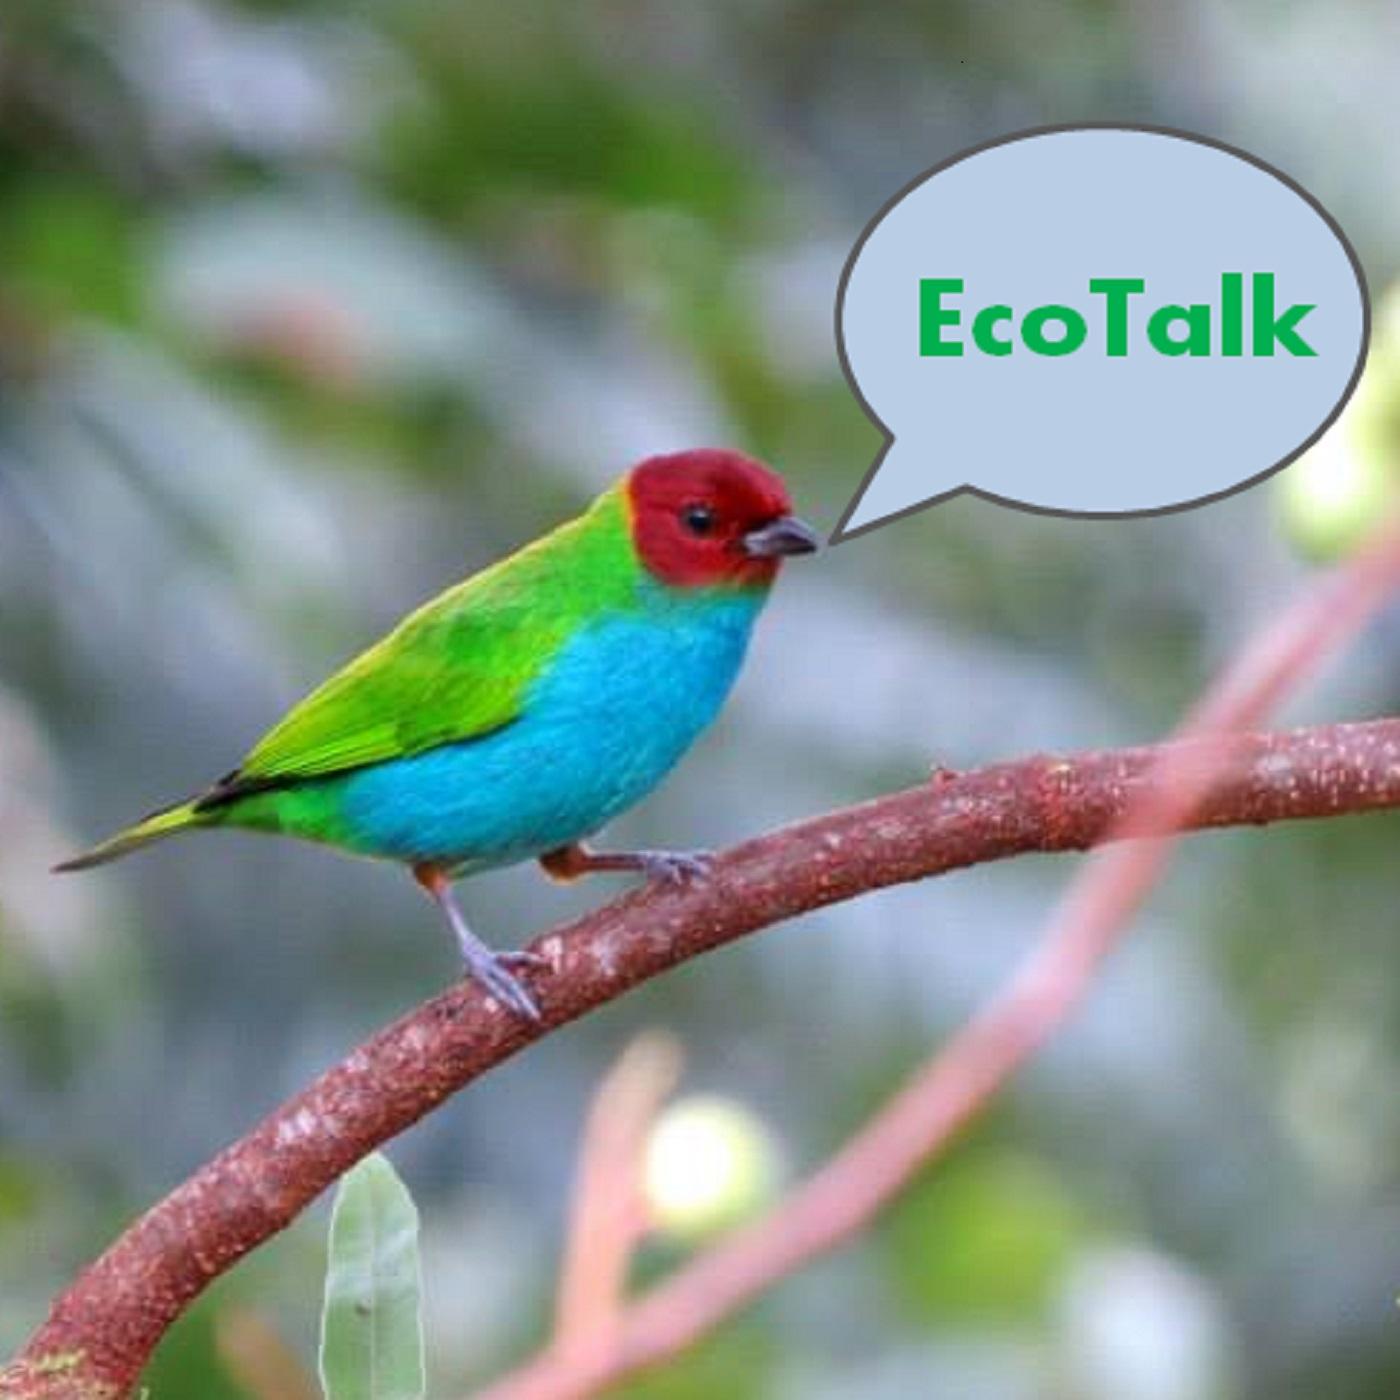 EcoTalk logo